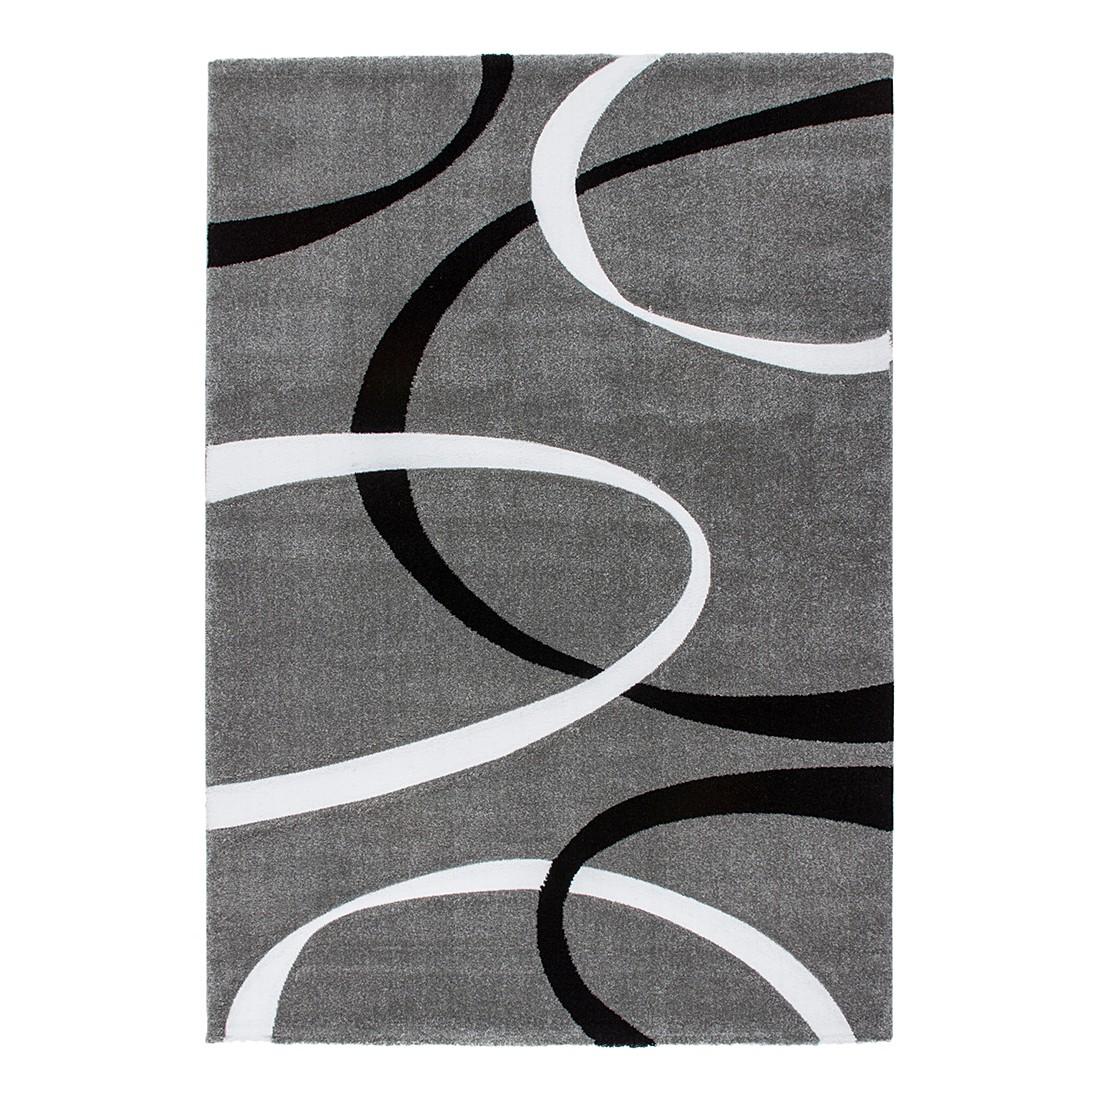 Teppich France – Lyon – Mehrfarbig – 160 x 230 cm, Kayoom günstig online kaufen